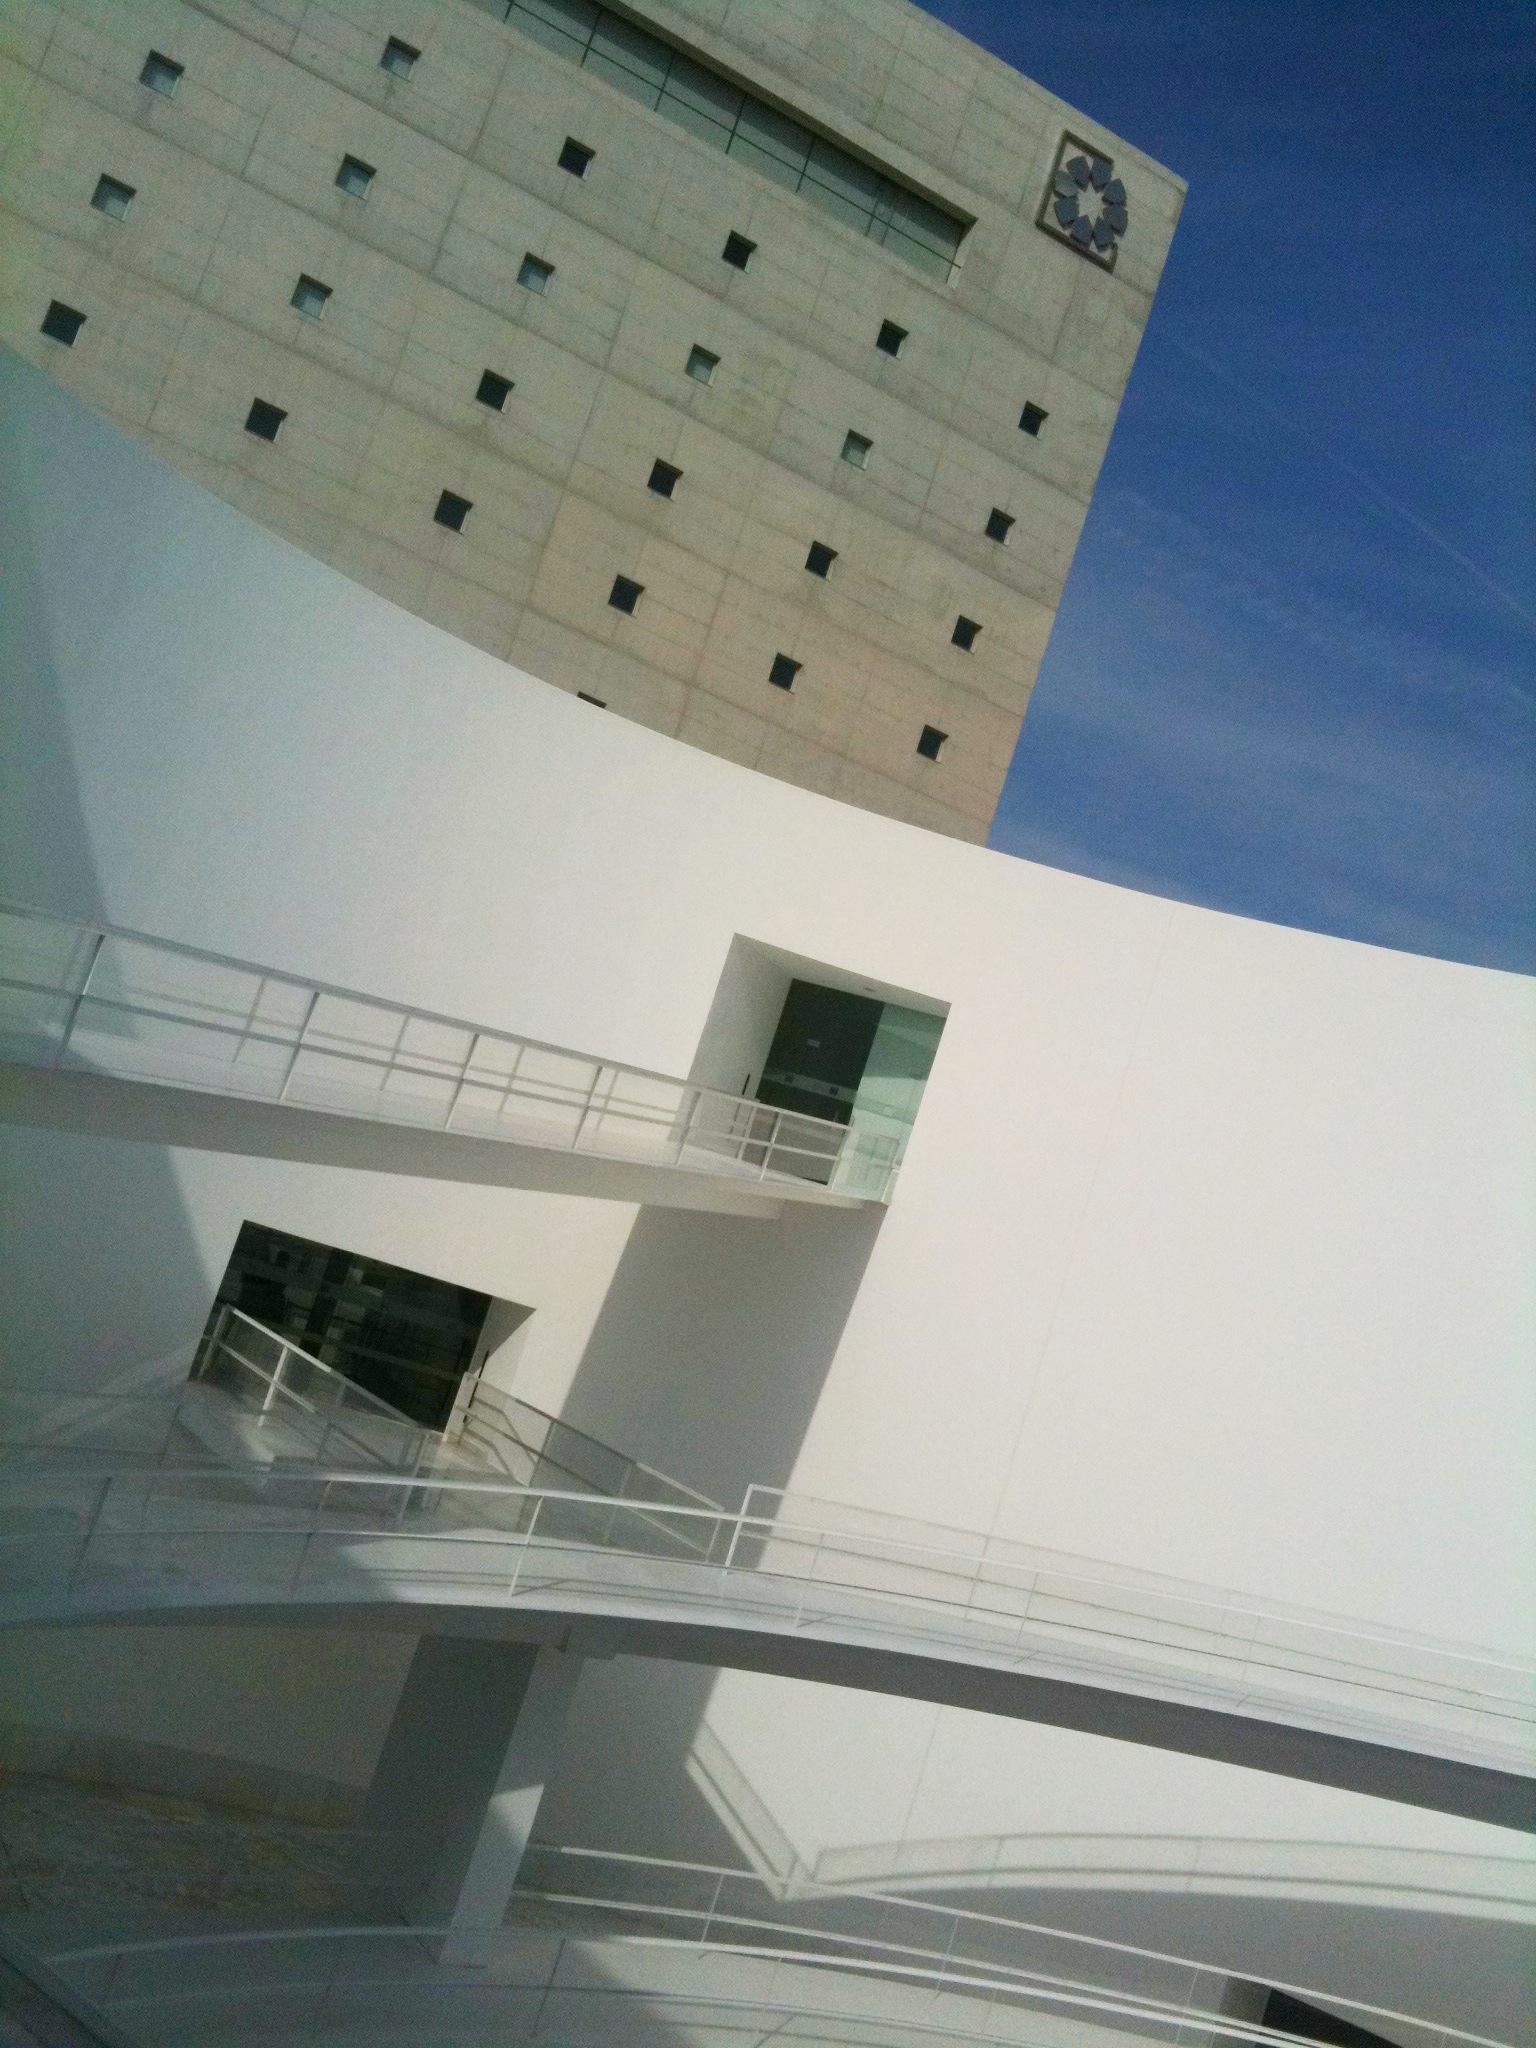 Centro Cultural CajaGranada Memoria de Andalucía copy right andrew forbes .com